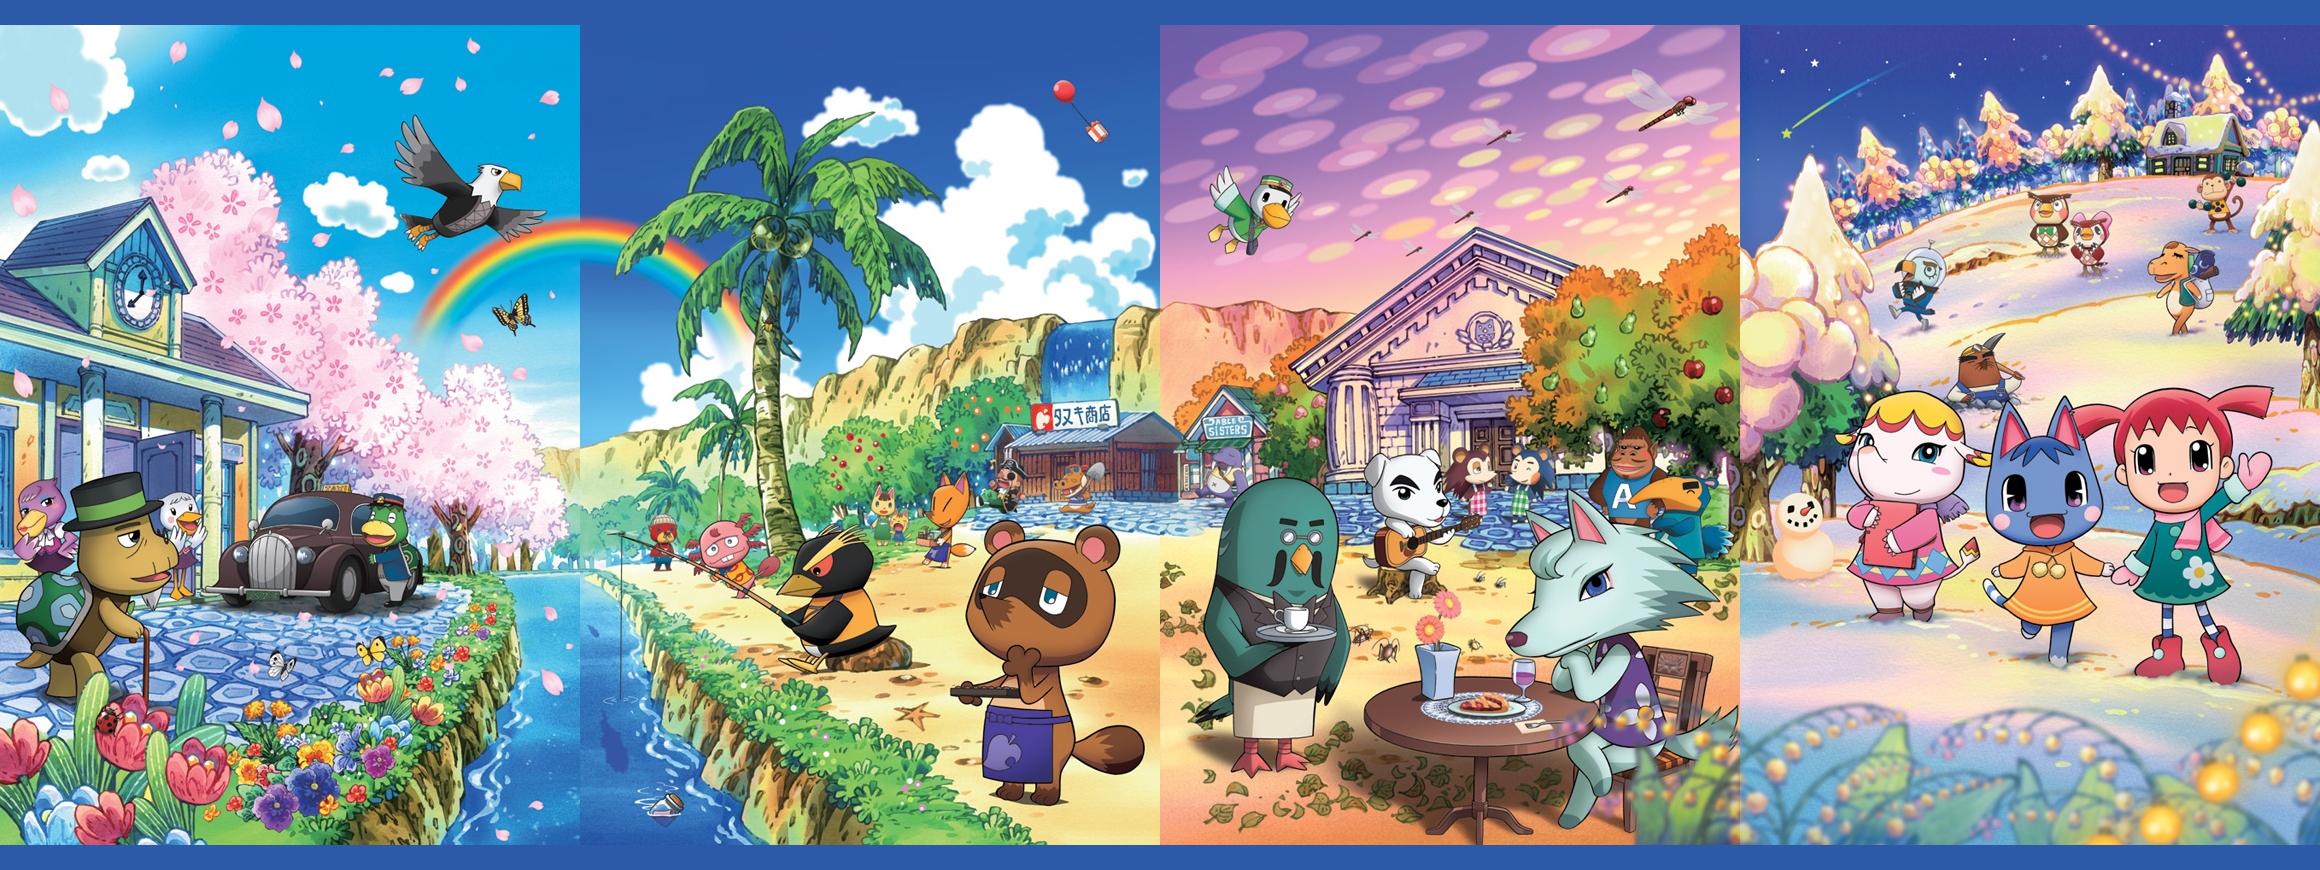 Free Download Animal Crossing Wallpaper Animal Crossing Wallpaper